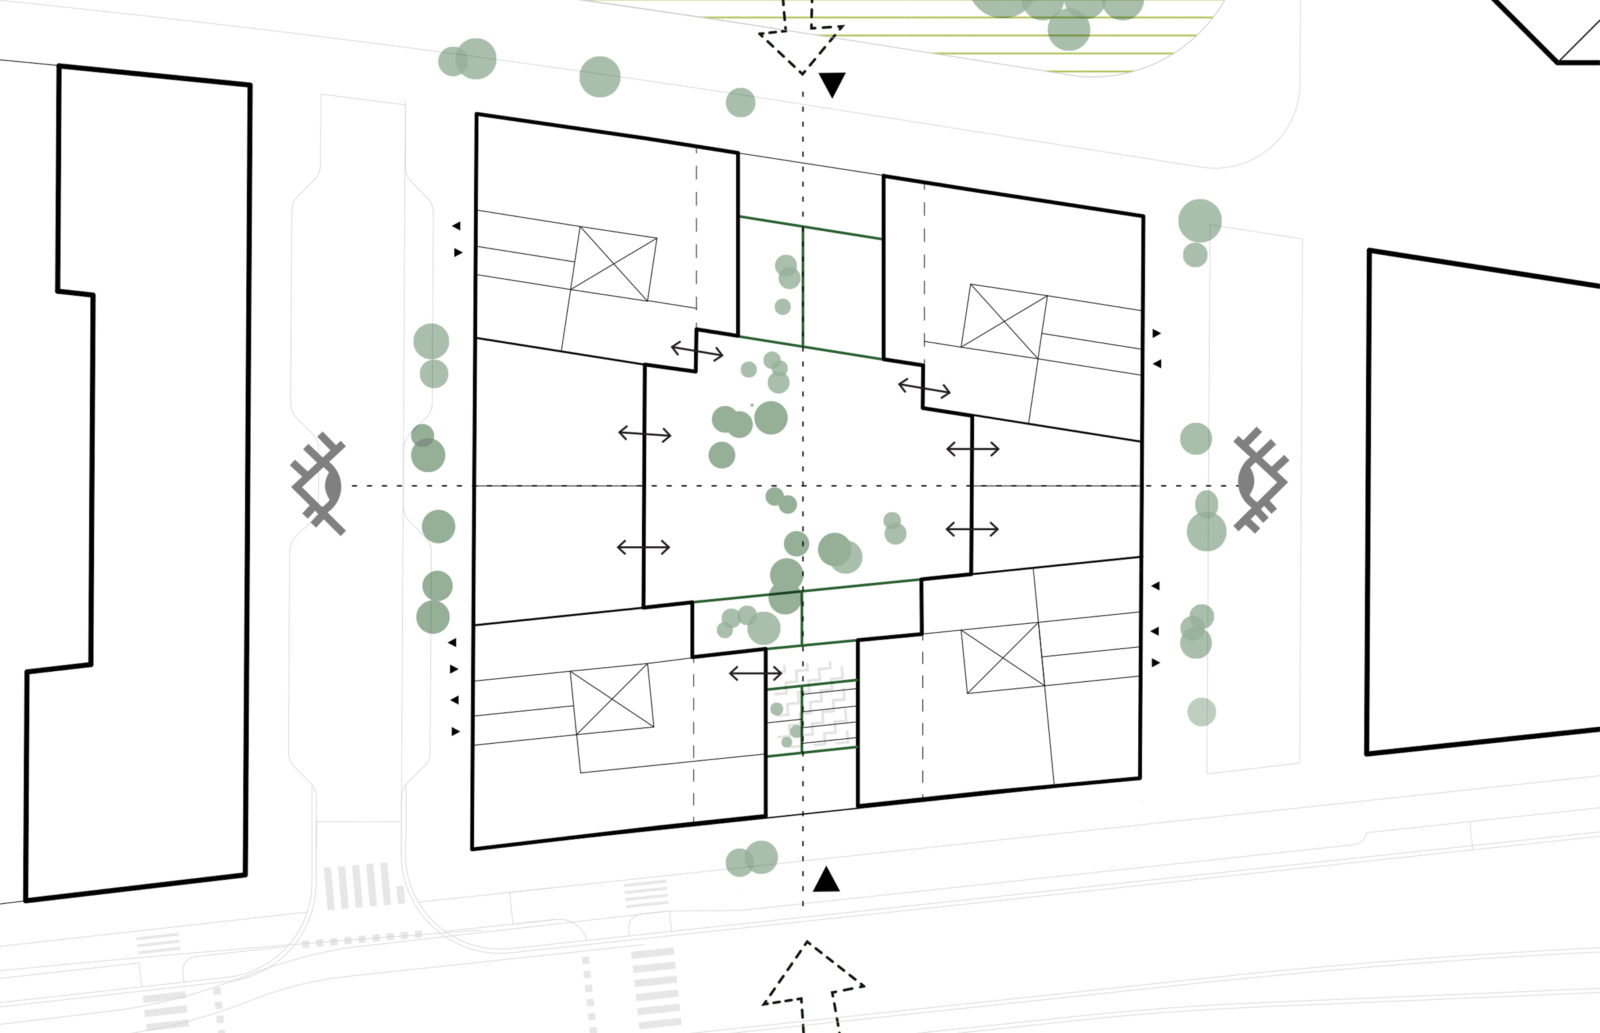 KjellanderSjoberg Ribosomen Site plan 01 3600x2324px